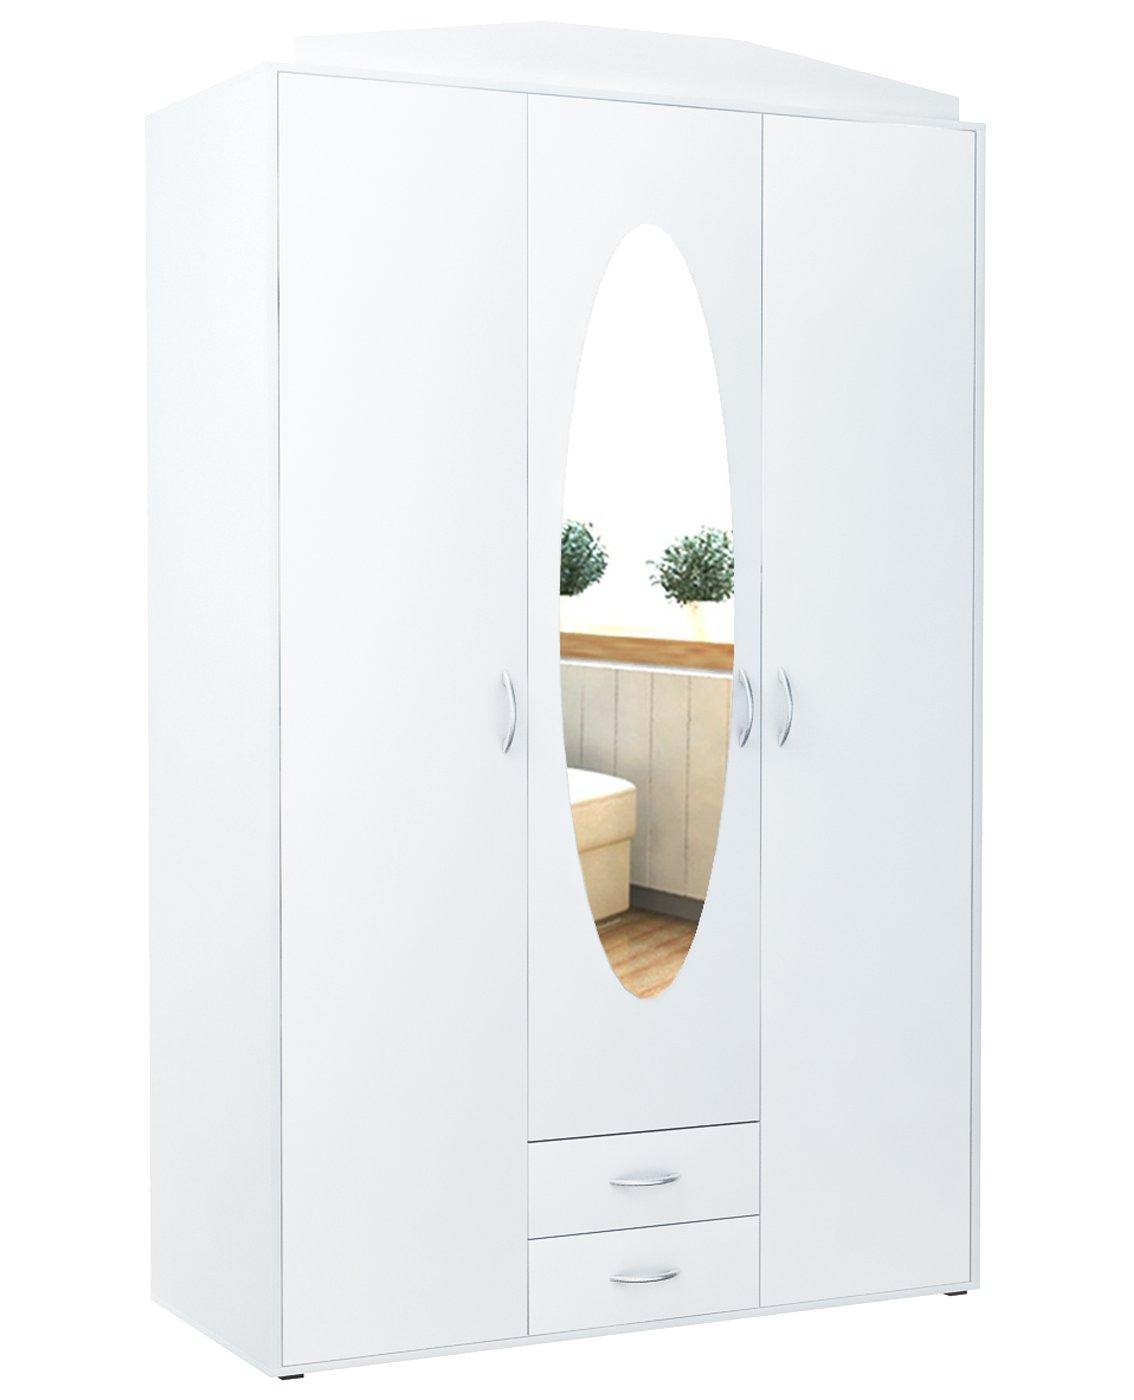 Шкаф 3D2S БЕЛЫЙ шкаф трехдверный с зеркалом